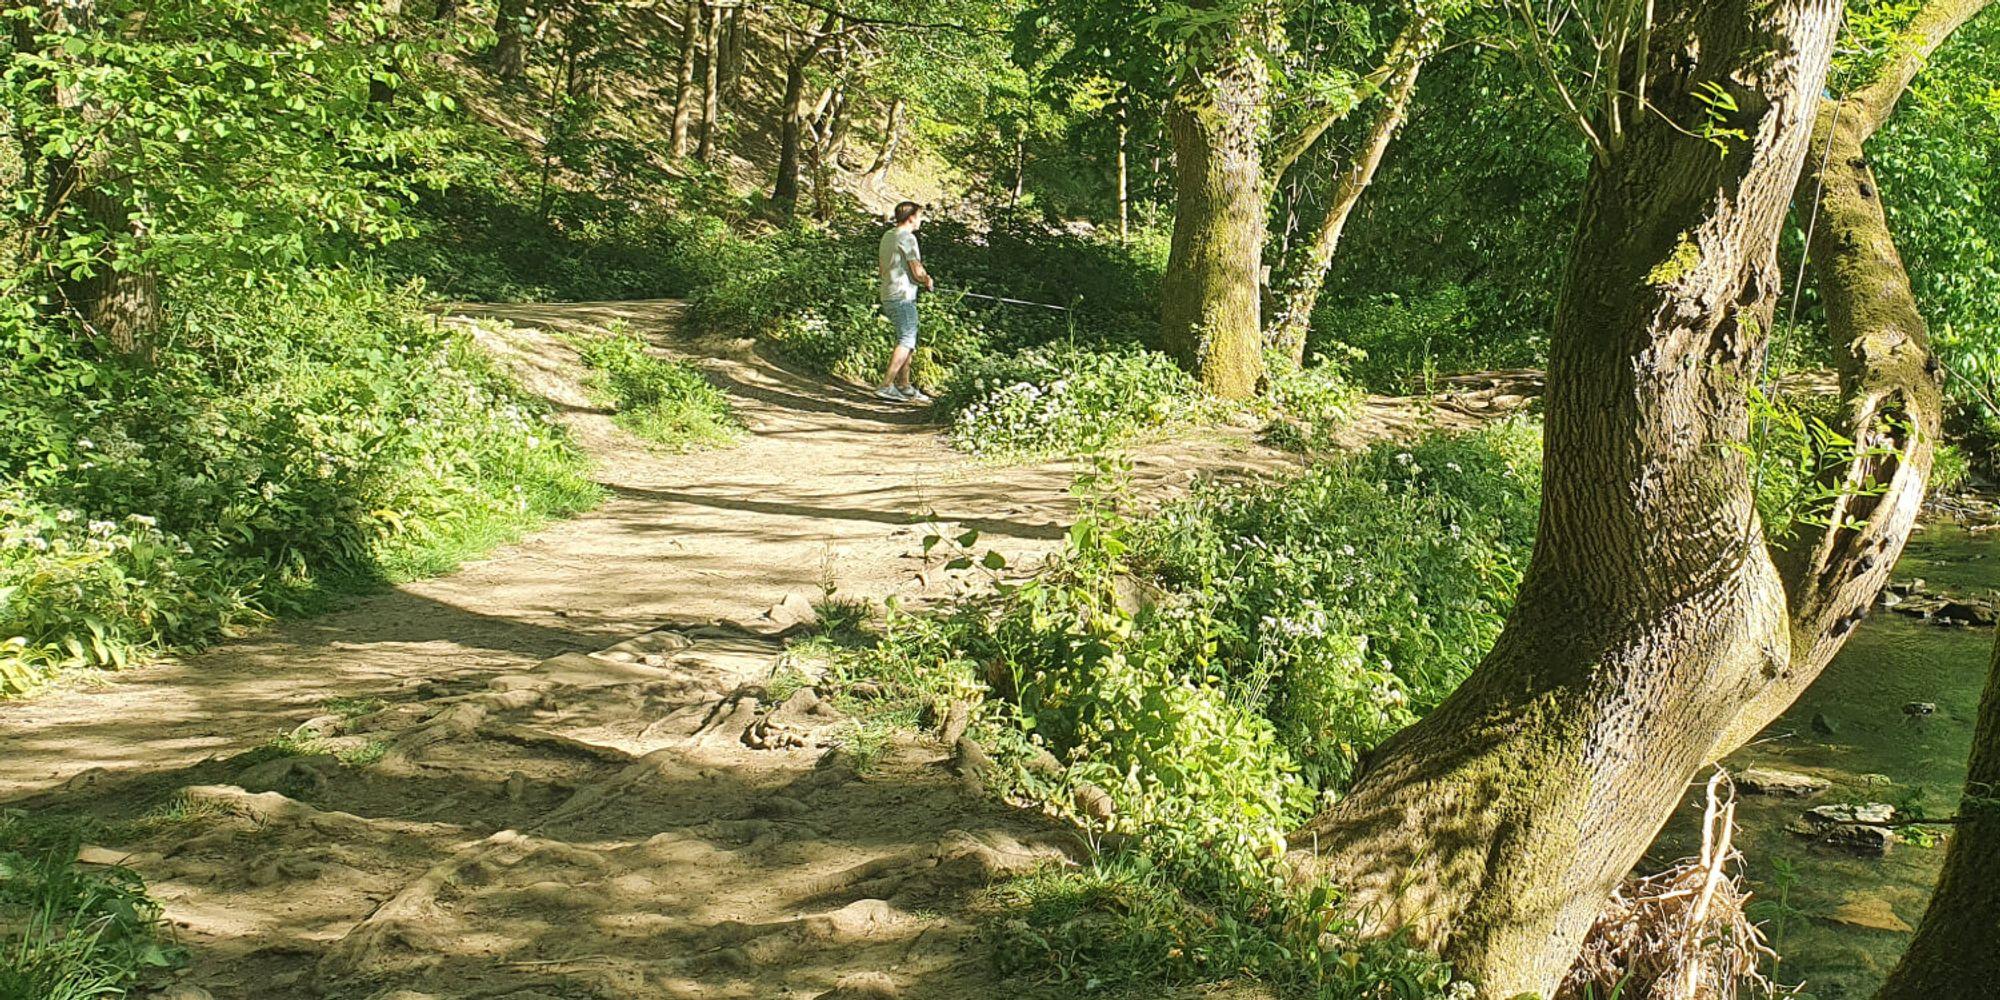 Dry dirt path weaving through Post Hill